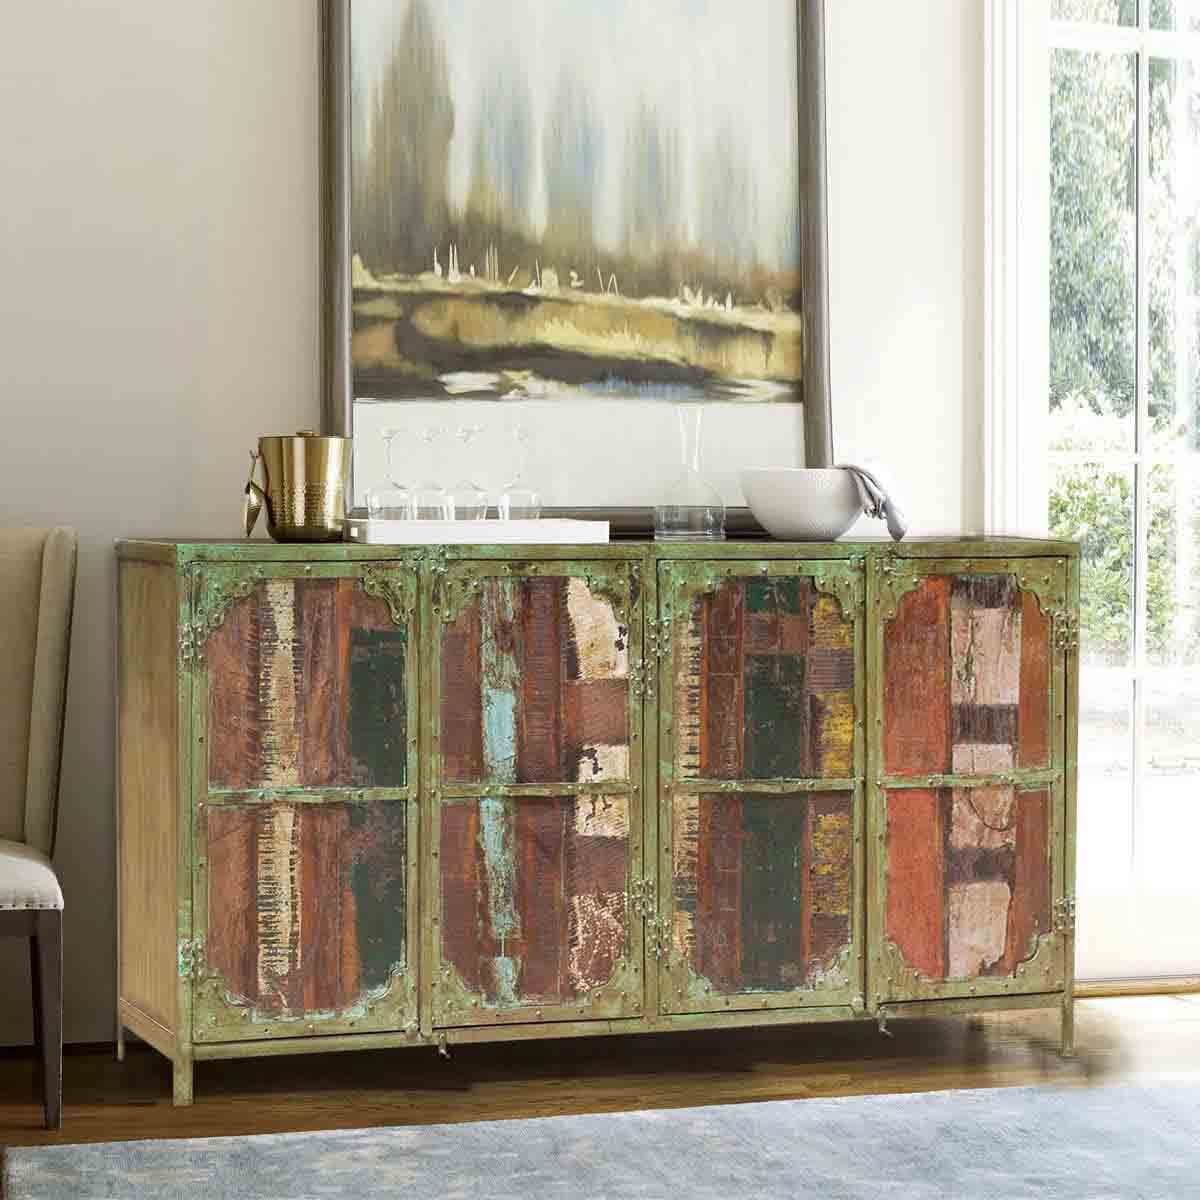 Reclaimed Wooden Buffets ~ Appalachian rustic reclaimed wood door industrial buffet